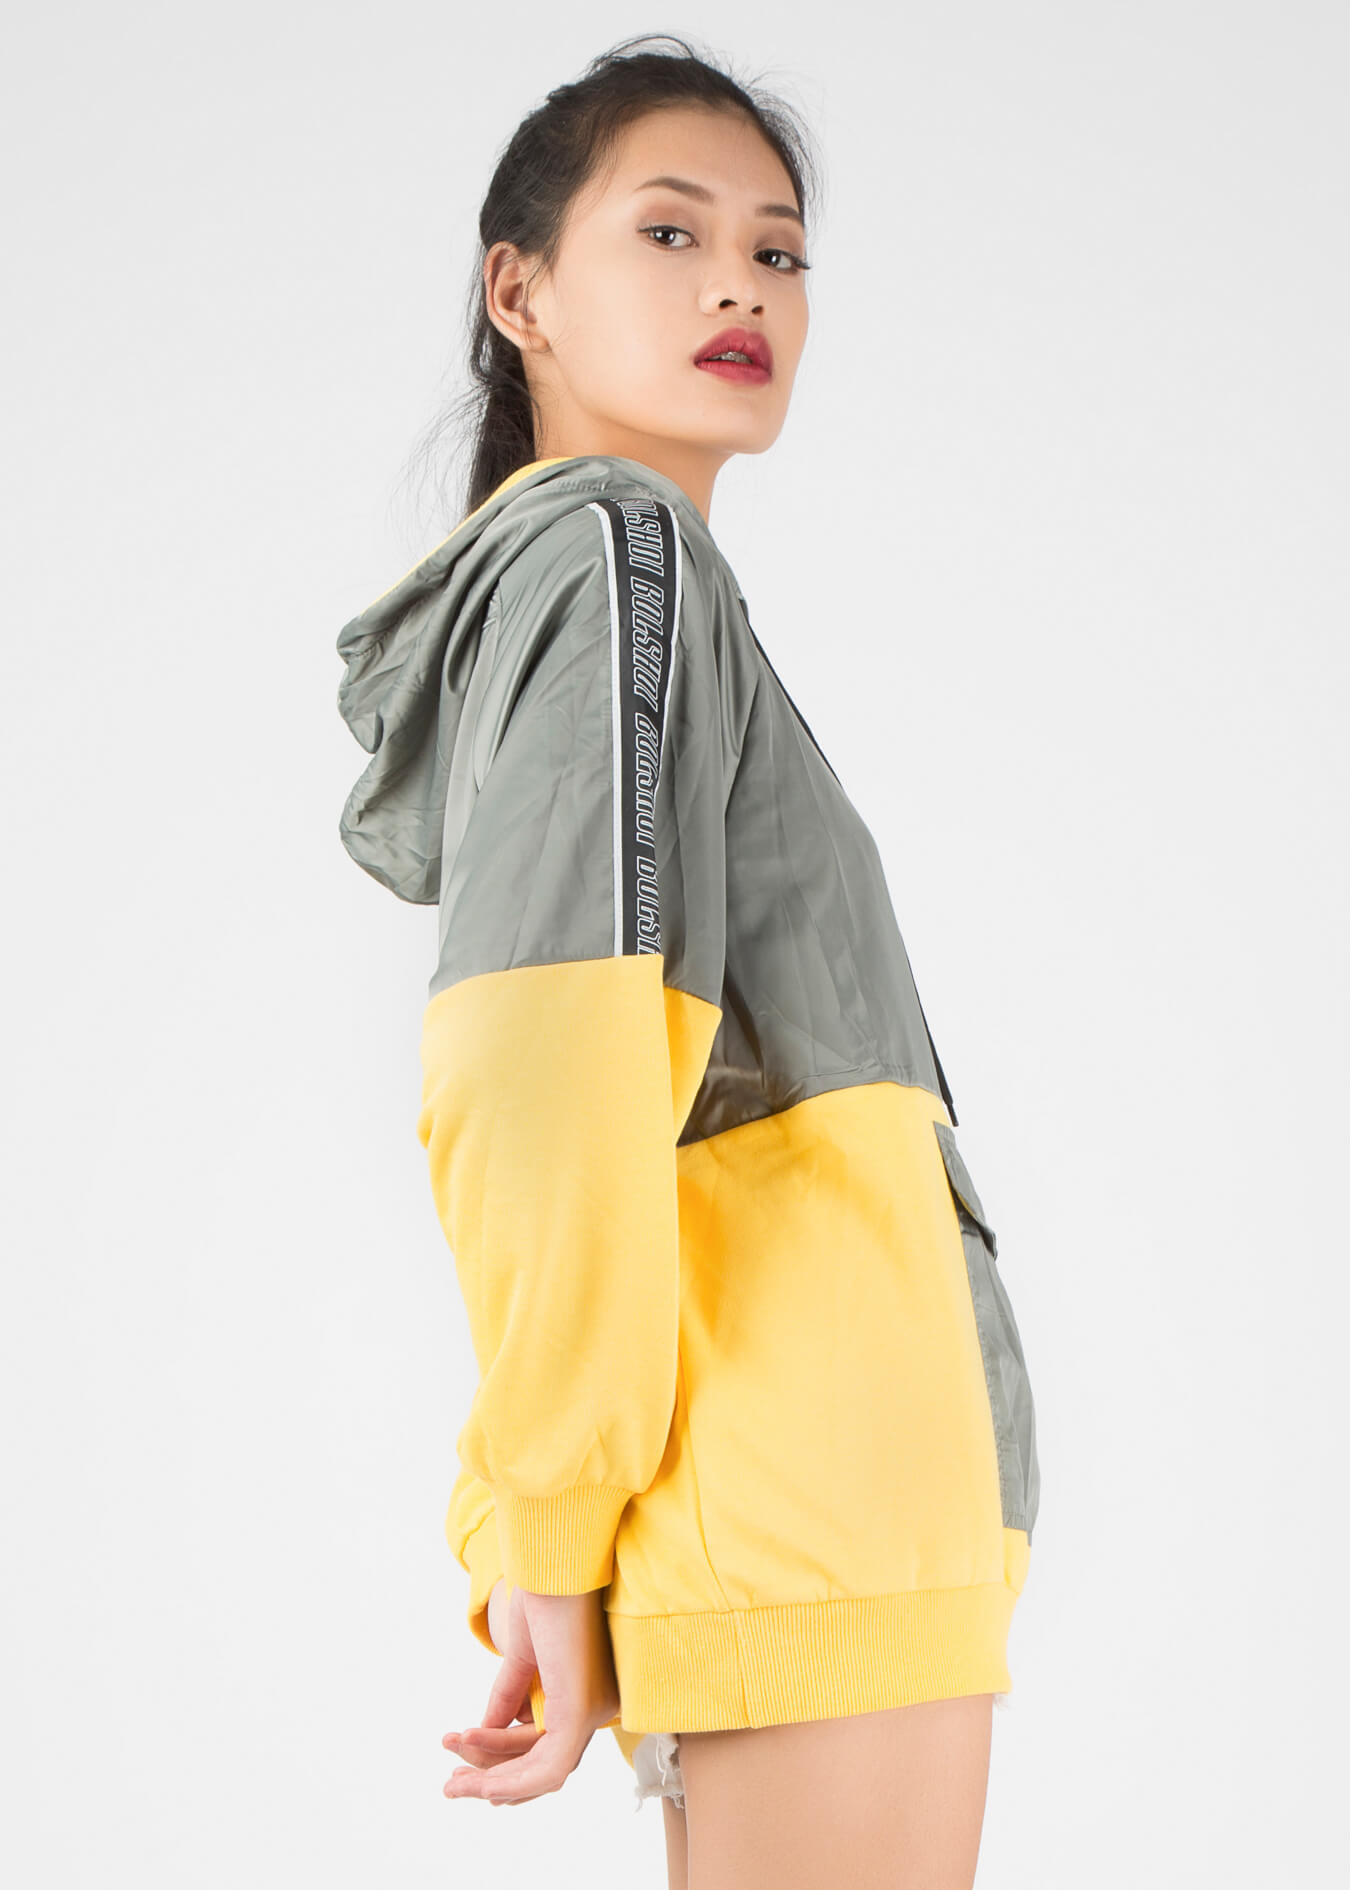 Áo hoodie unisex túi hộp